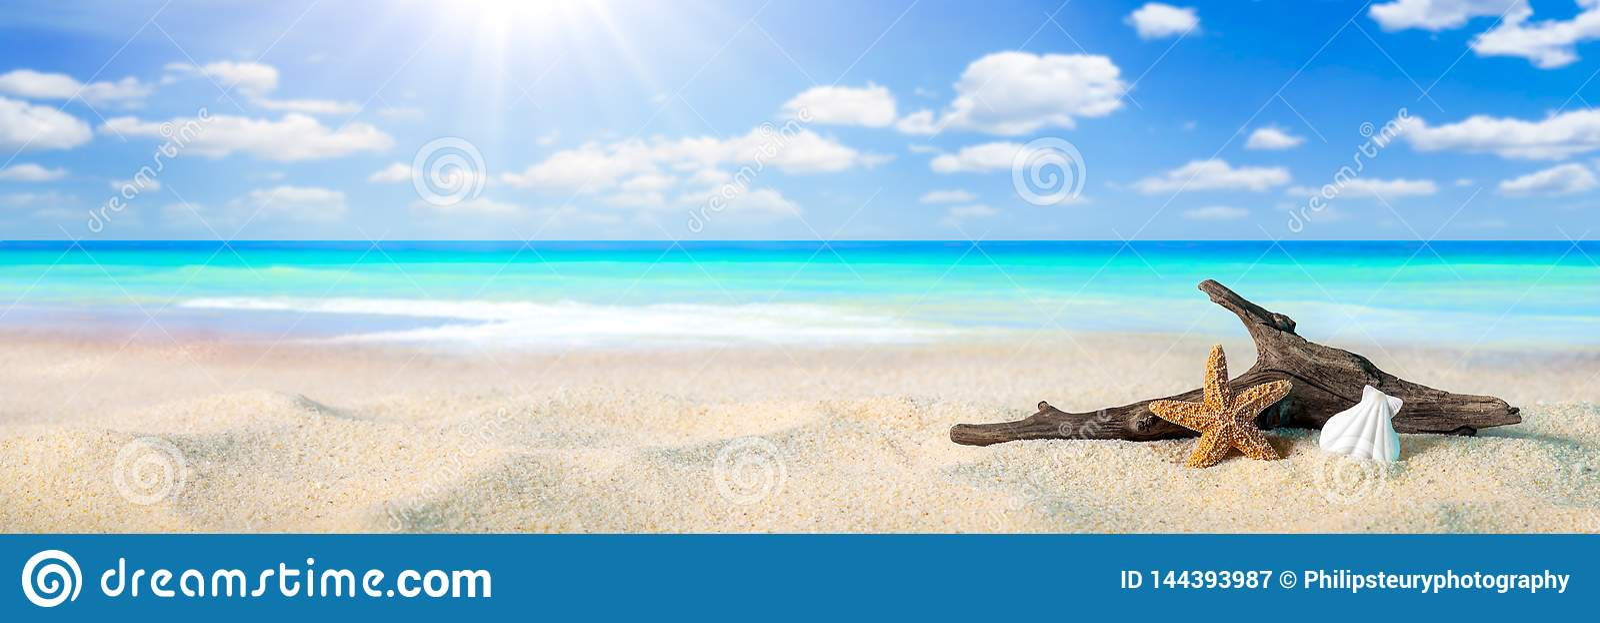 Solsken på stranden